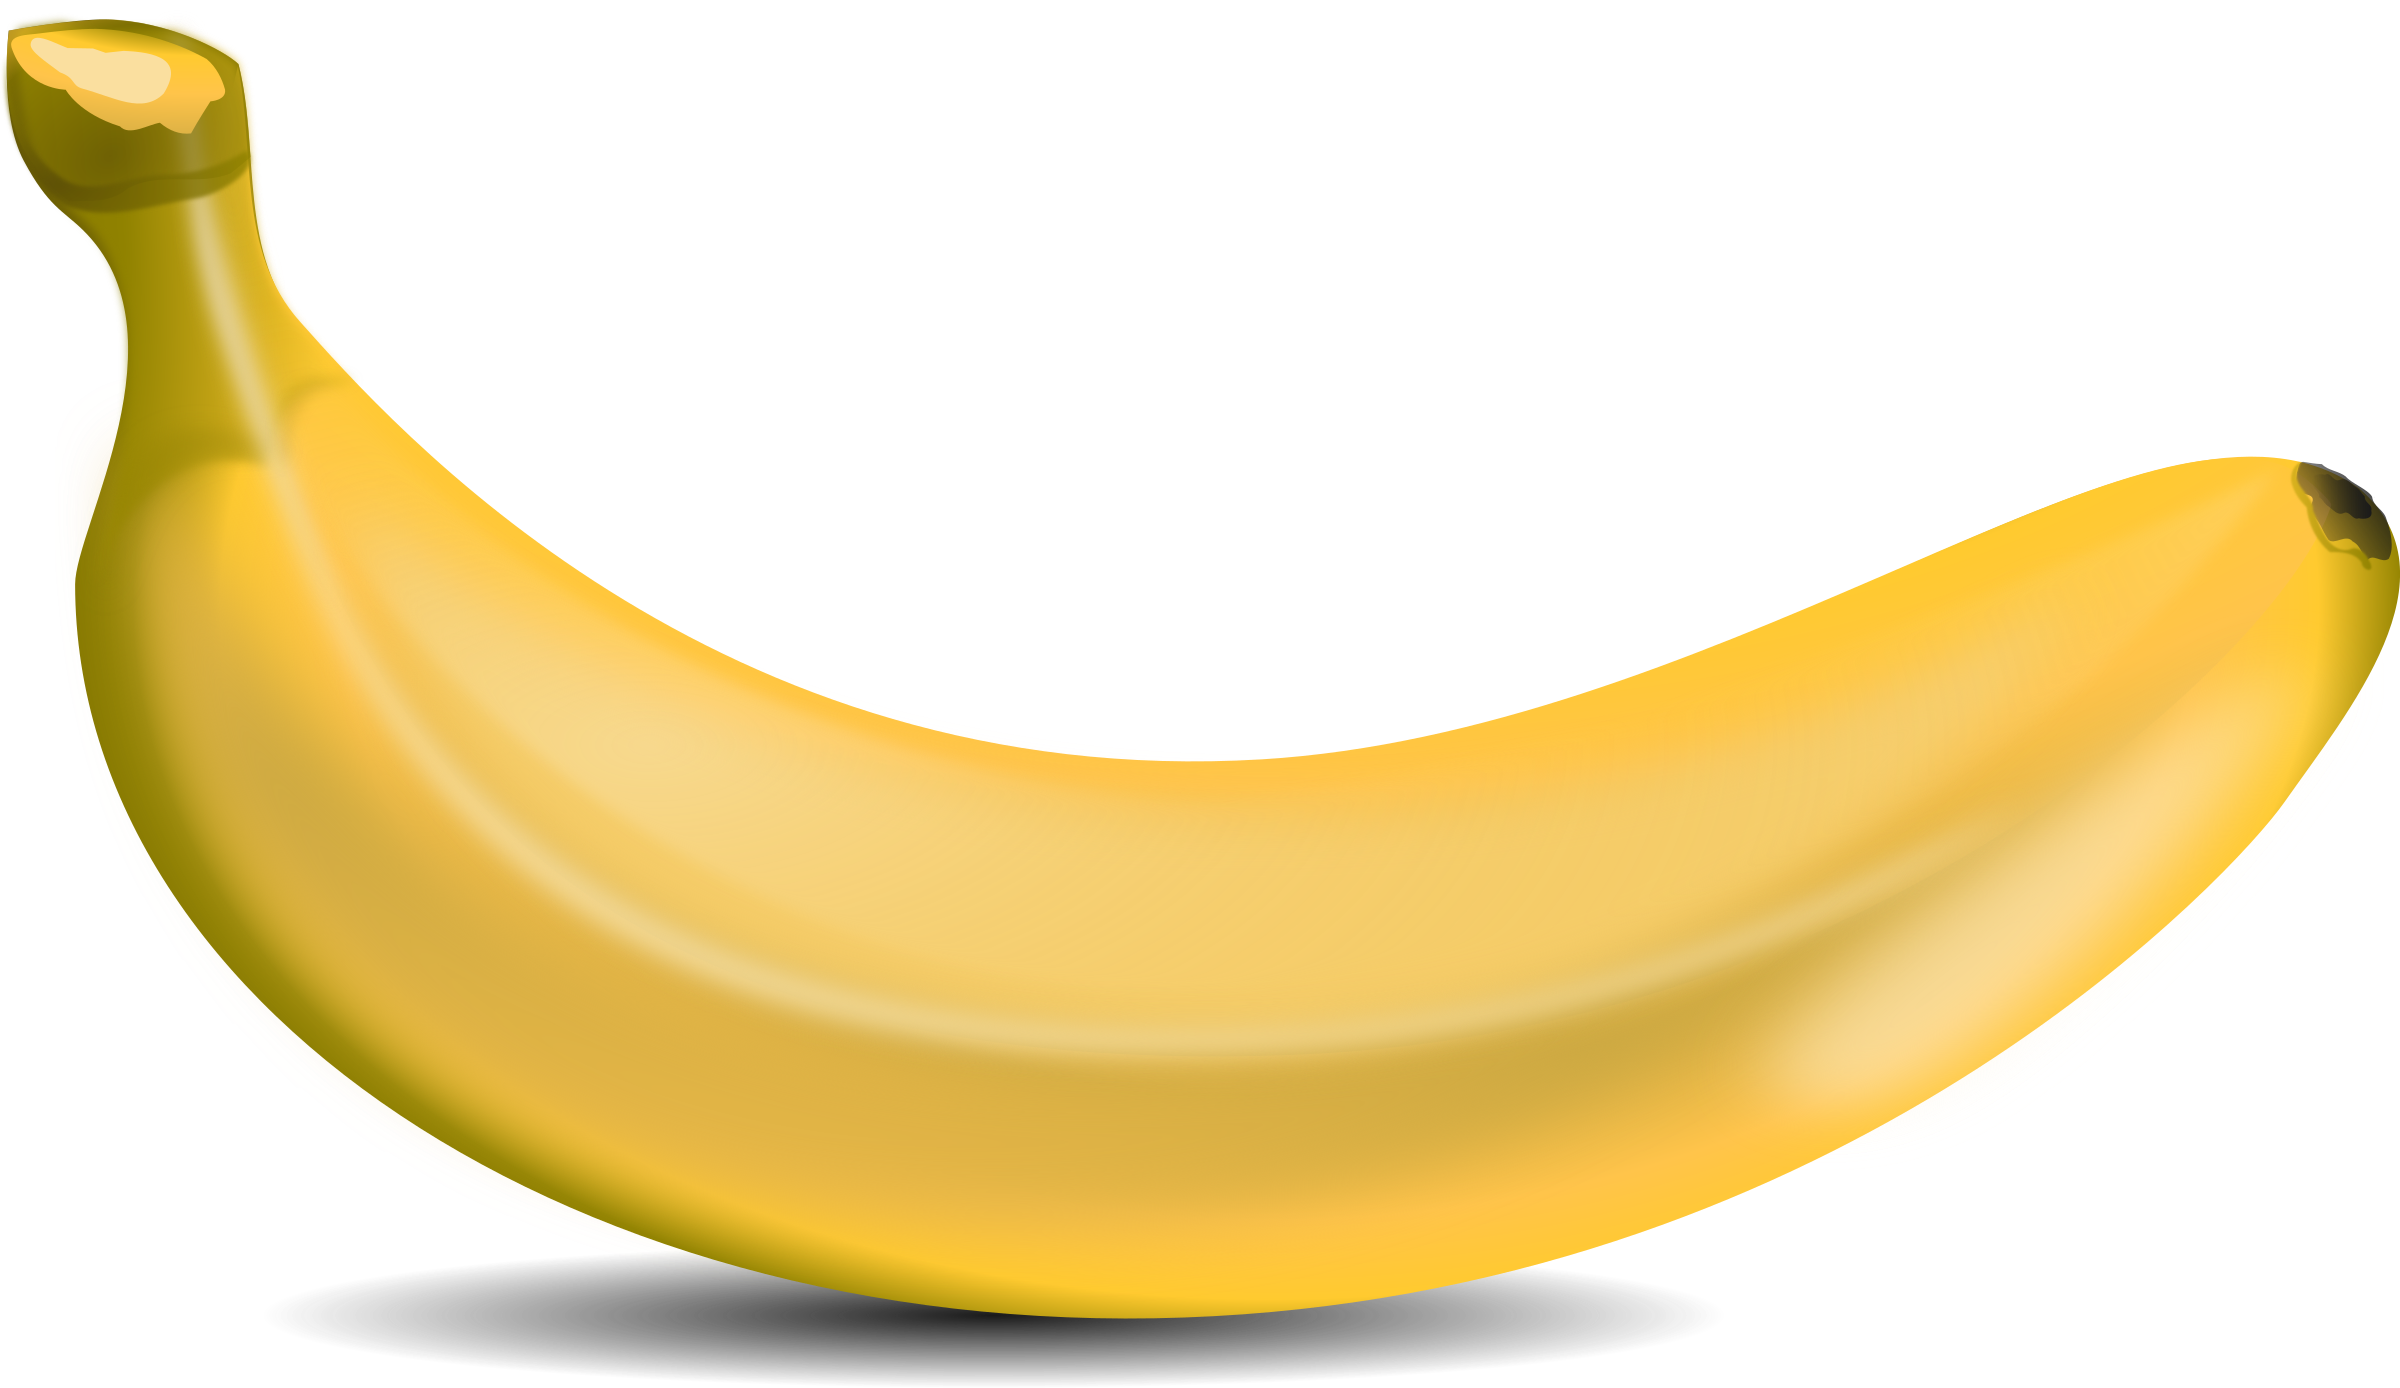 graphic free library Banana png images transparent. Bananas vector diagram